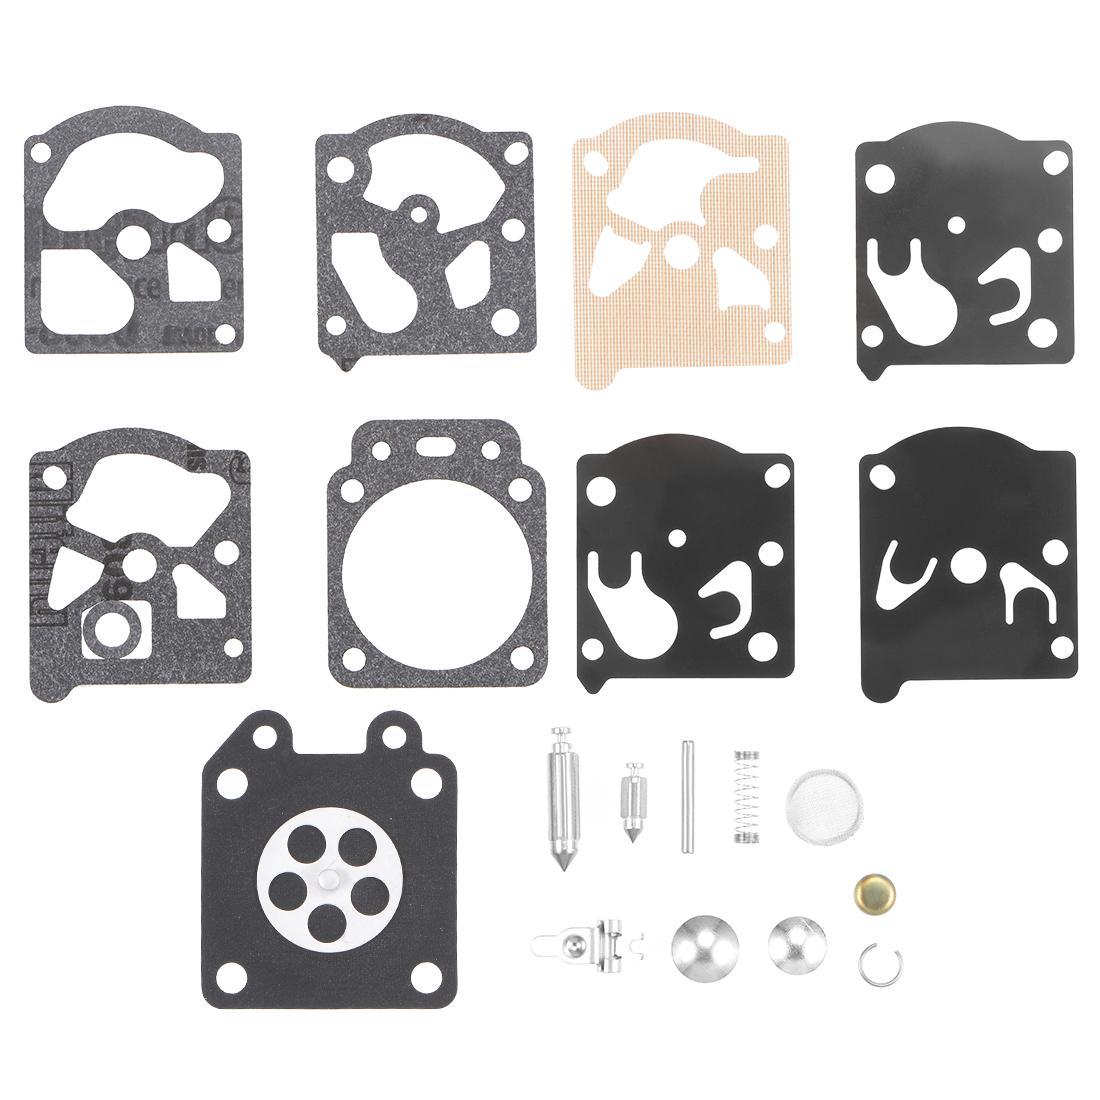 K24-WAT Carburetor Rebuild Kit Gasket for Walbro K24 WAT K24WAT WT973 2pcs